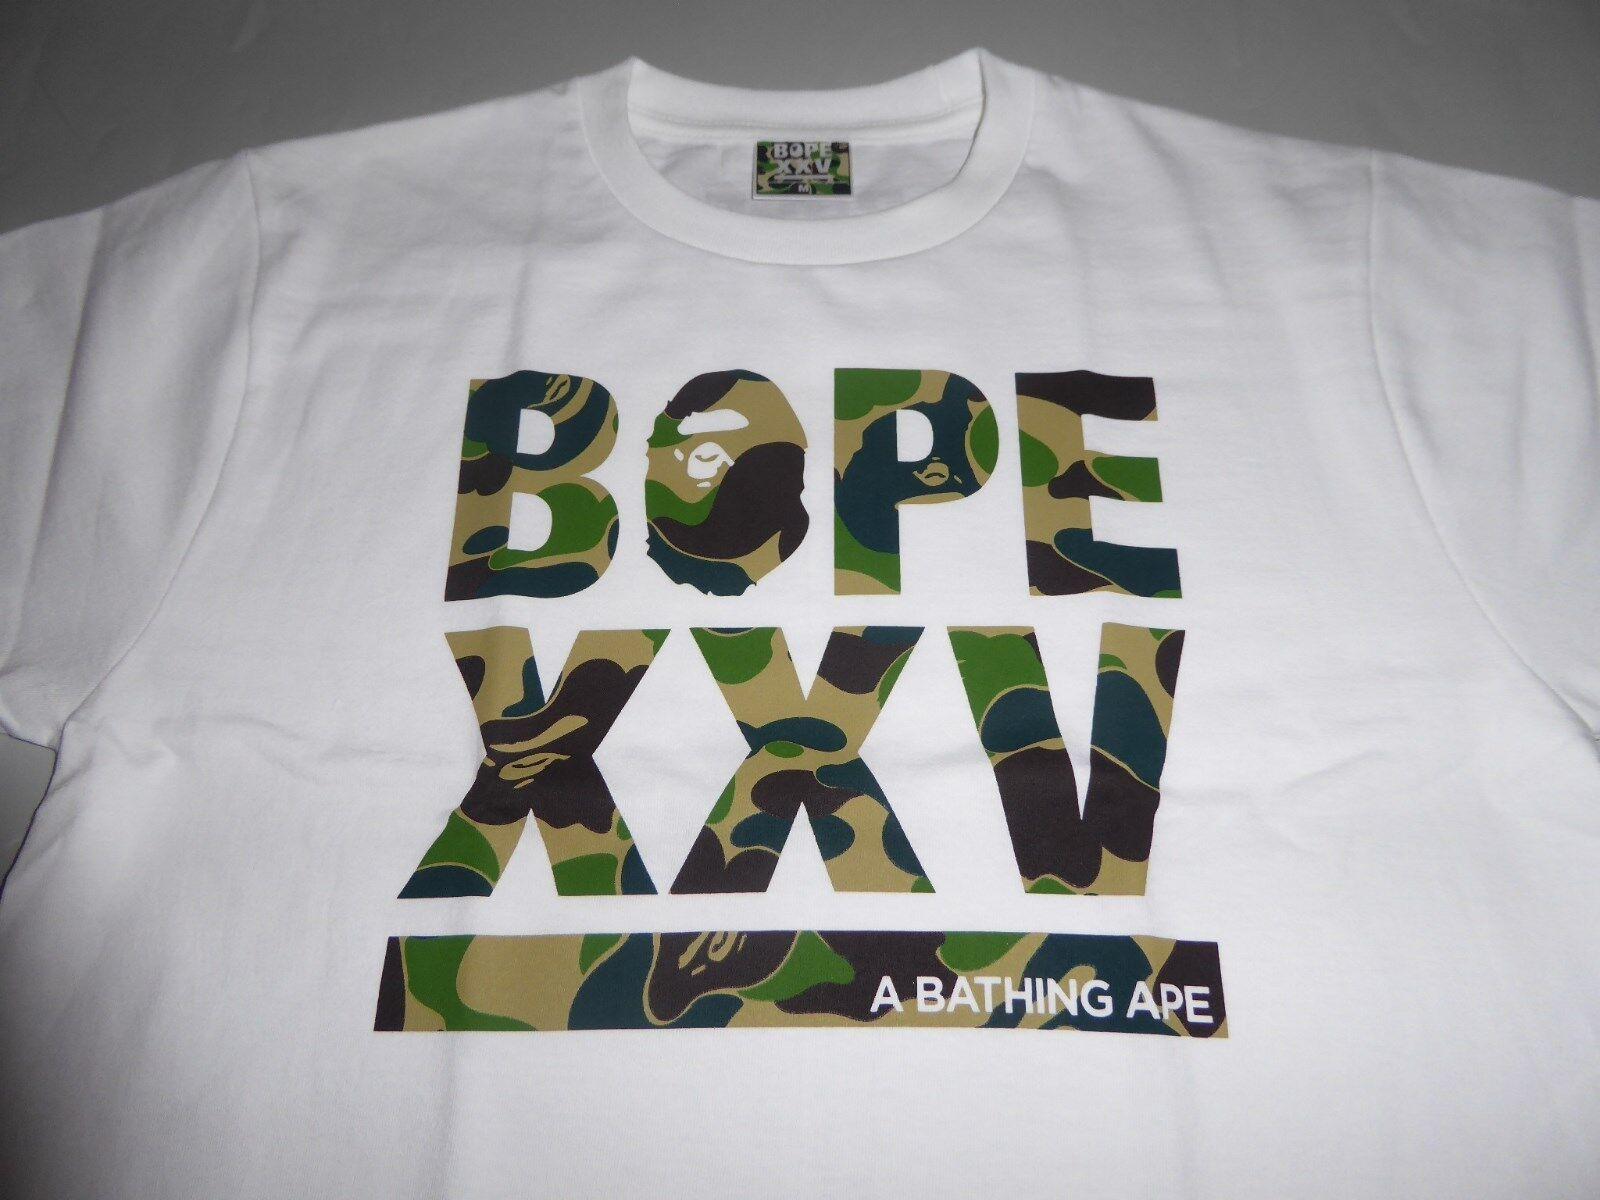 17293 bape xxv cities camo logo white green tee L